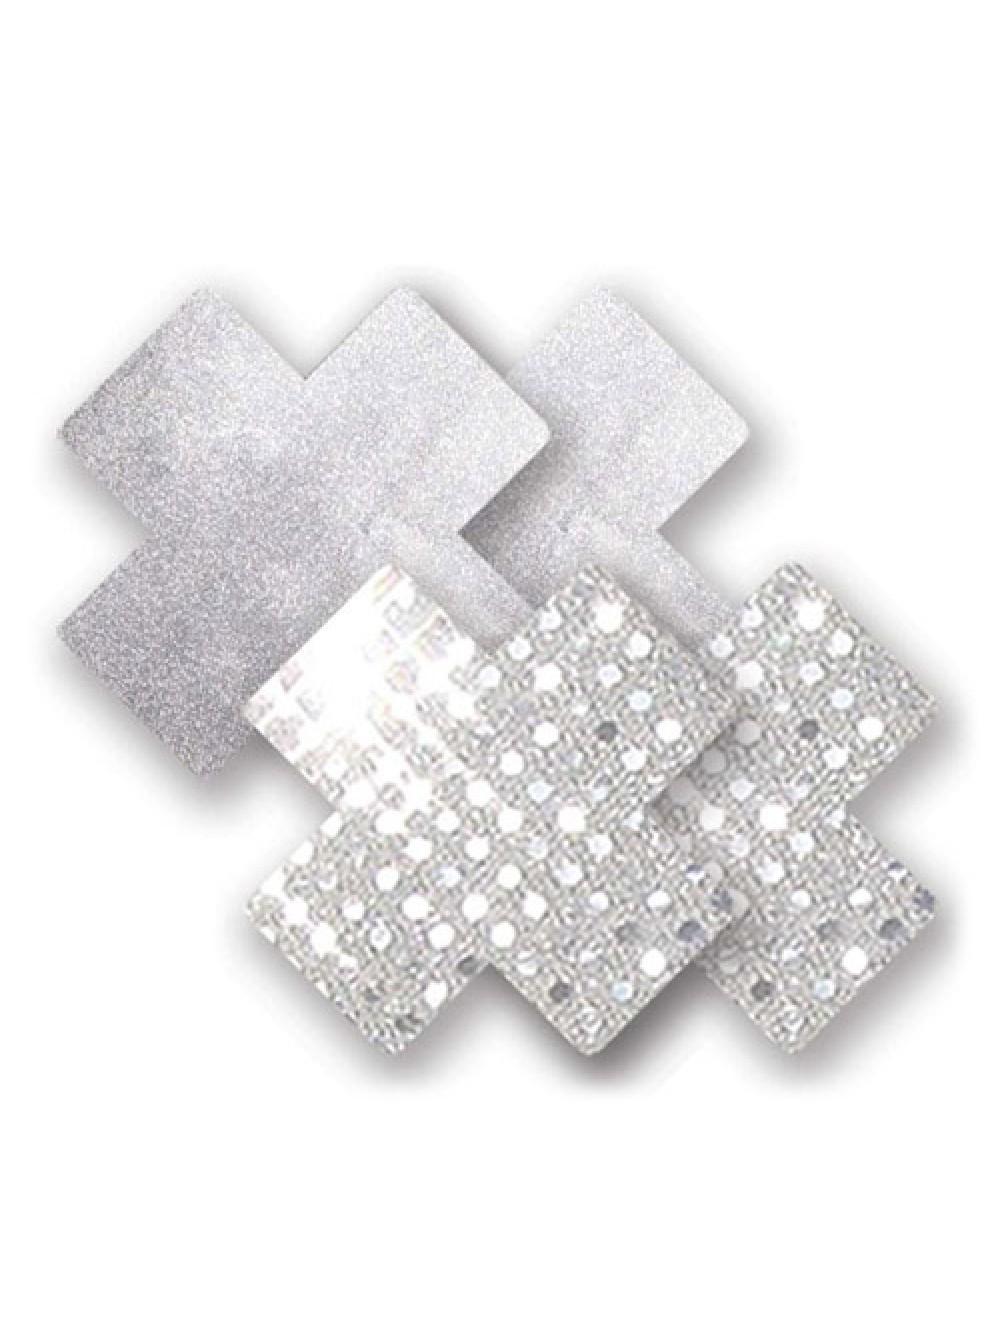 Nippies Pasties - Studio Silver Cross 876651001235